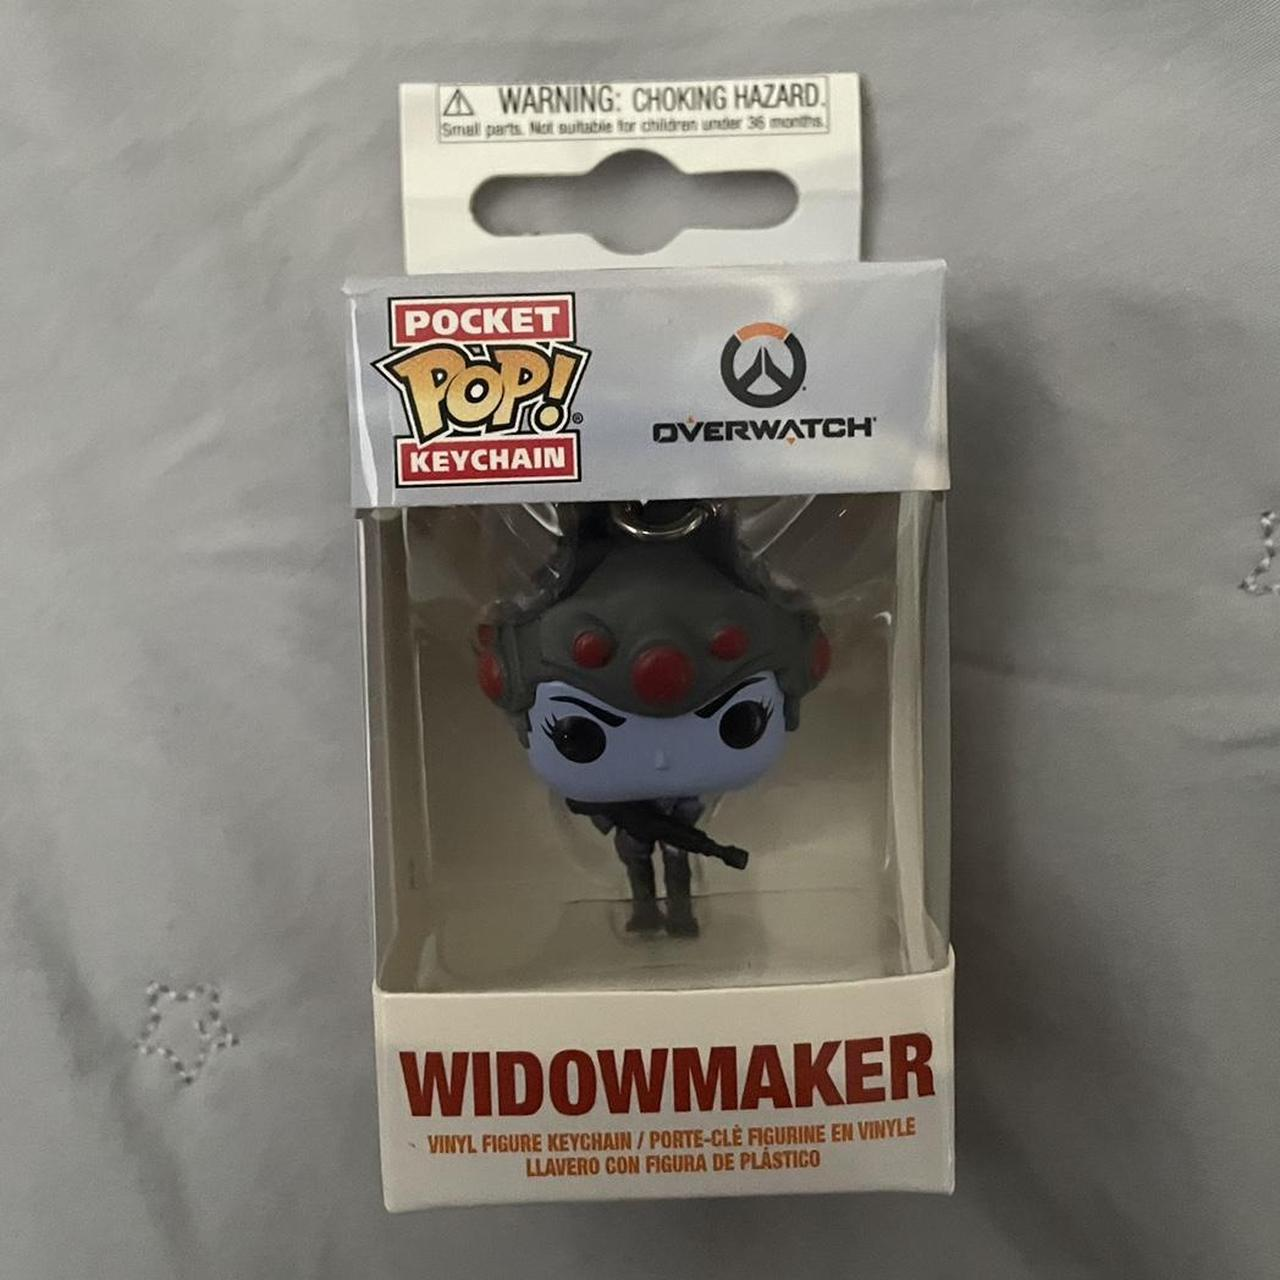 Product Image 1 - Funko Pop Widowmaker Keychain  #overwatch #widowmaker